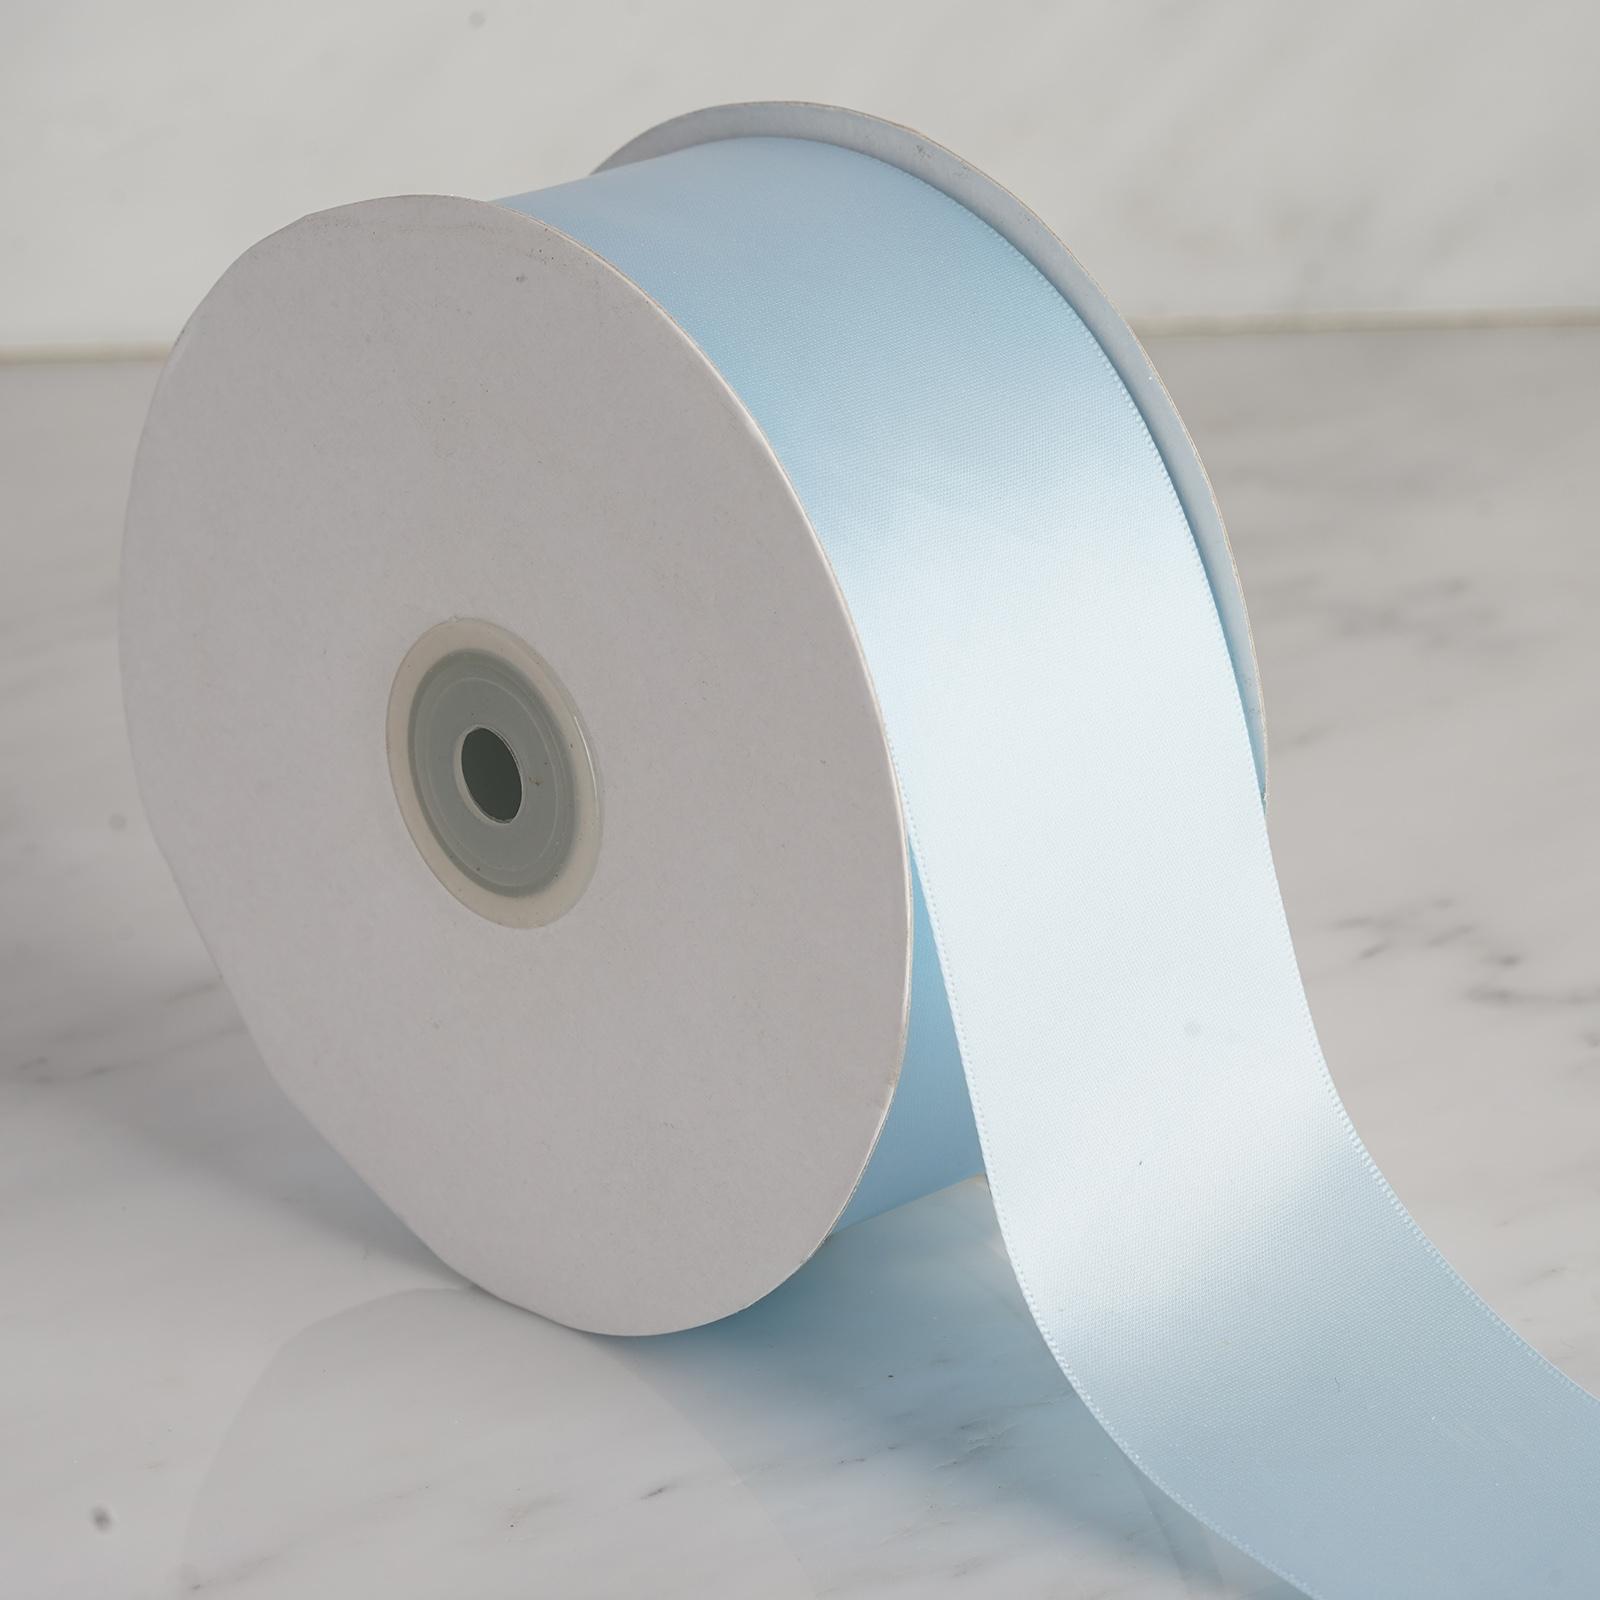 2-034-x-50-yards-Single-Side-Satin-Ribbon-Wedding-Favors-Sewing-Crafts-Decorations thumbnail 13